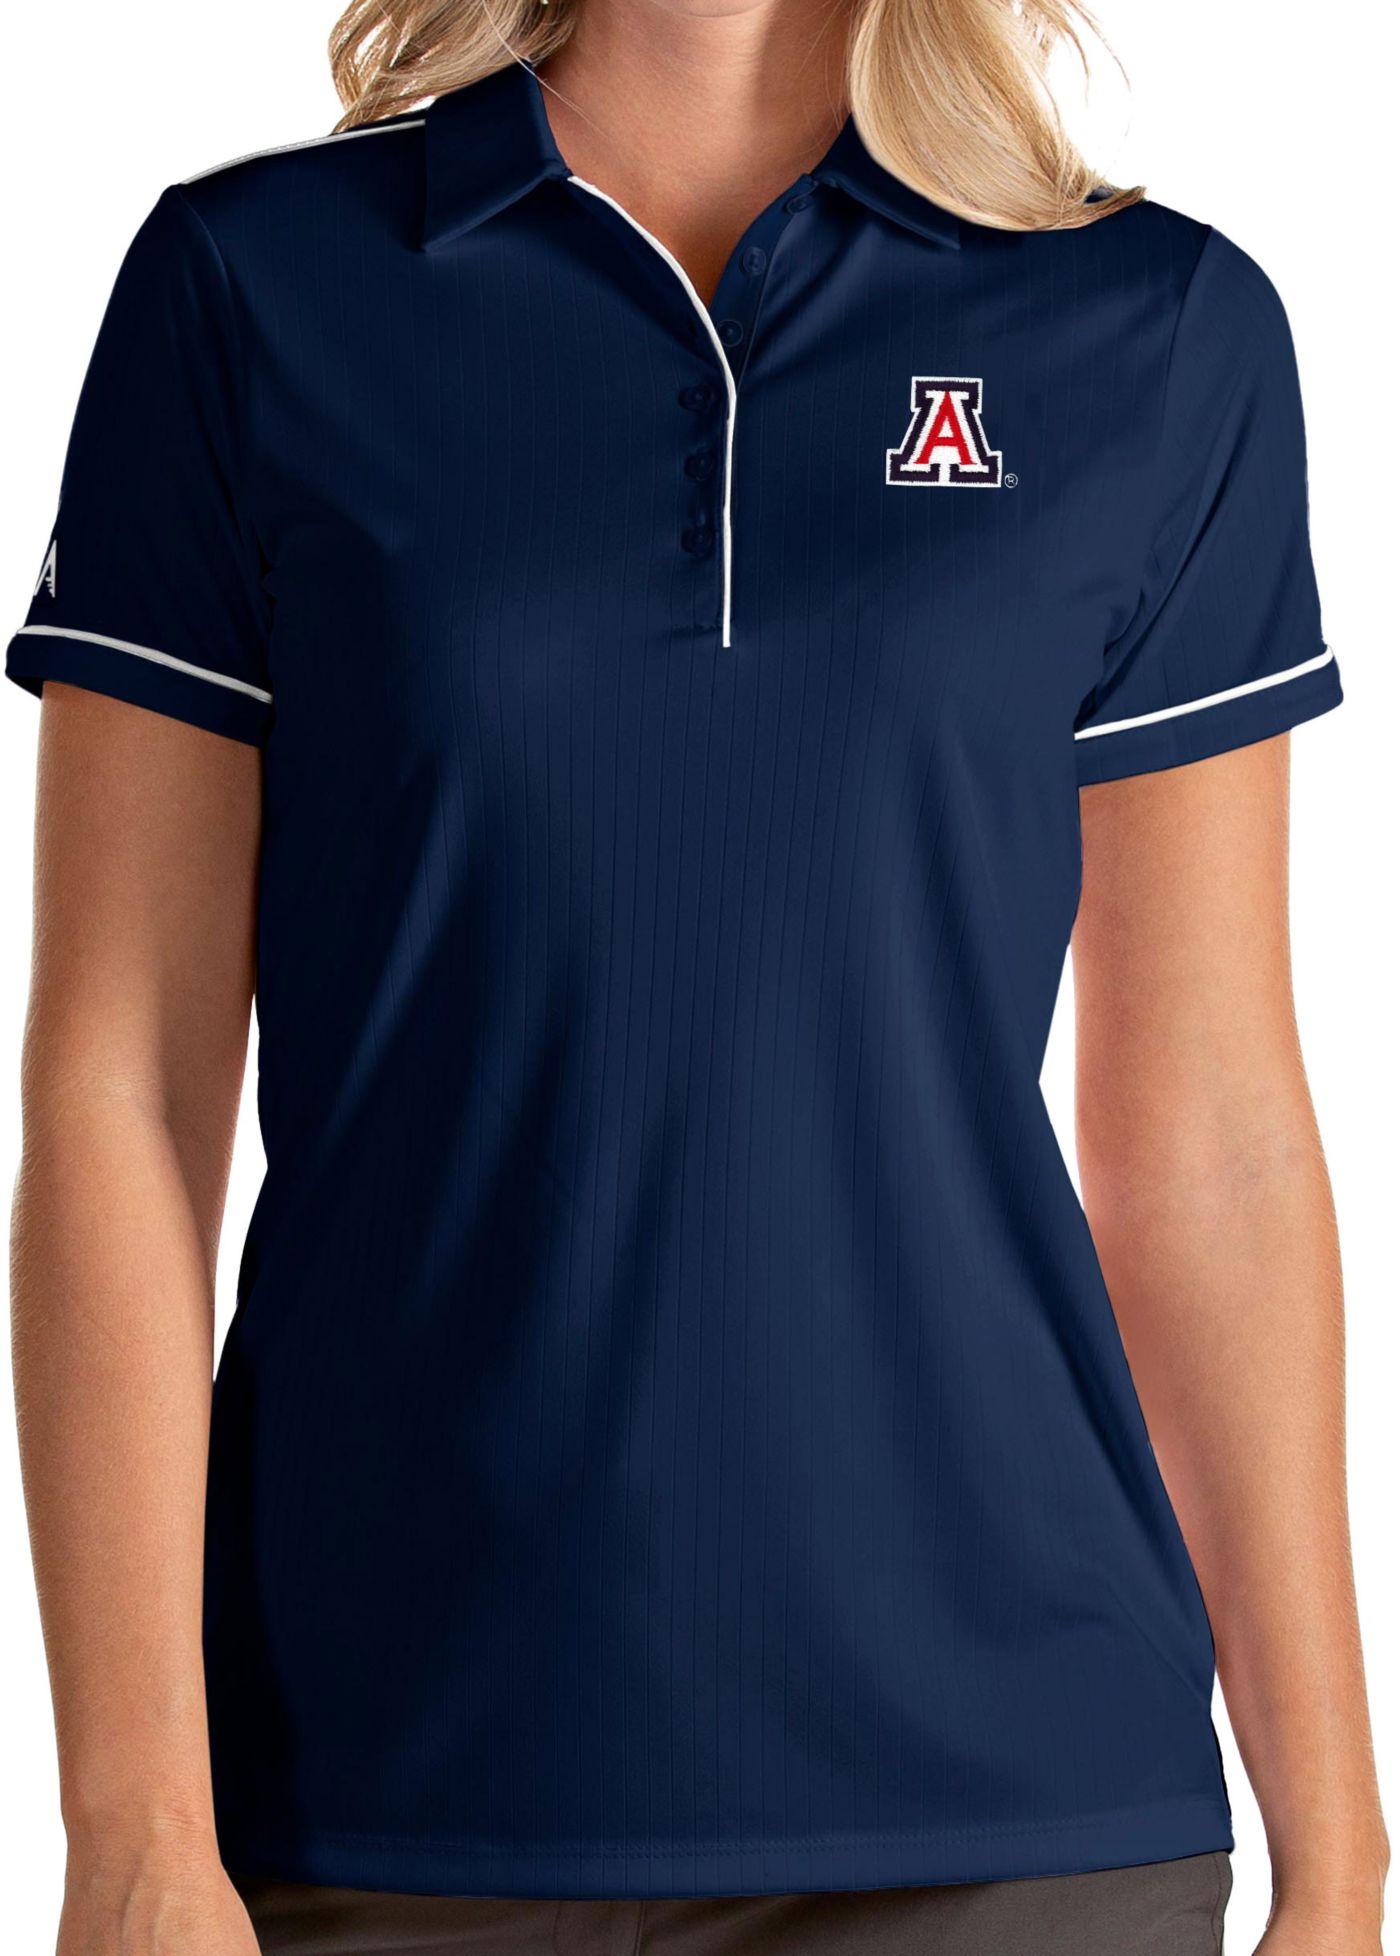 Antigua Women's Arizona Wildcats Navy Salute Performance Polo